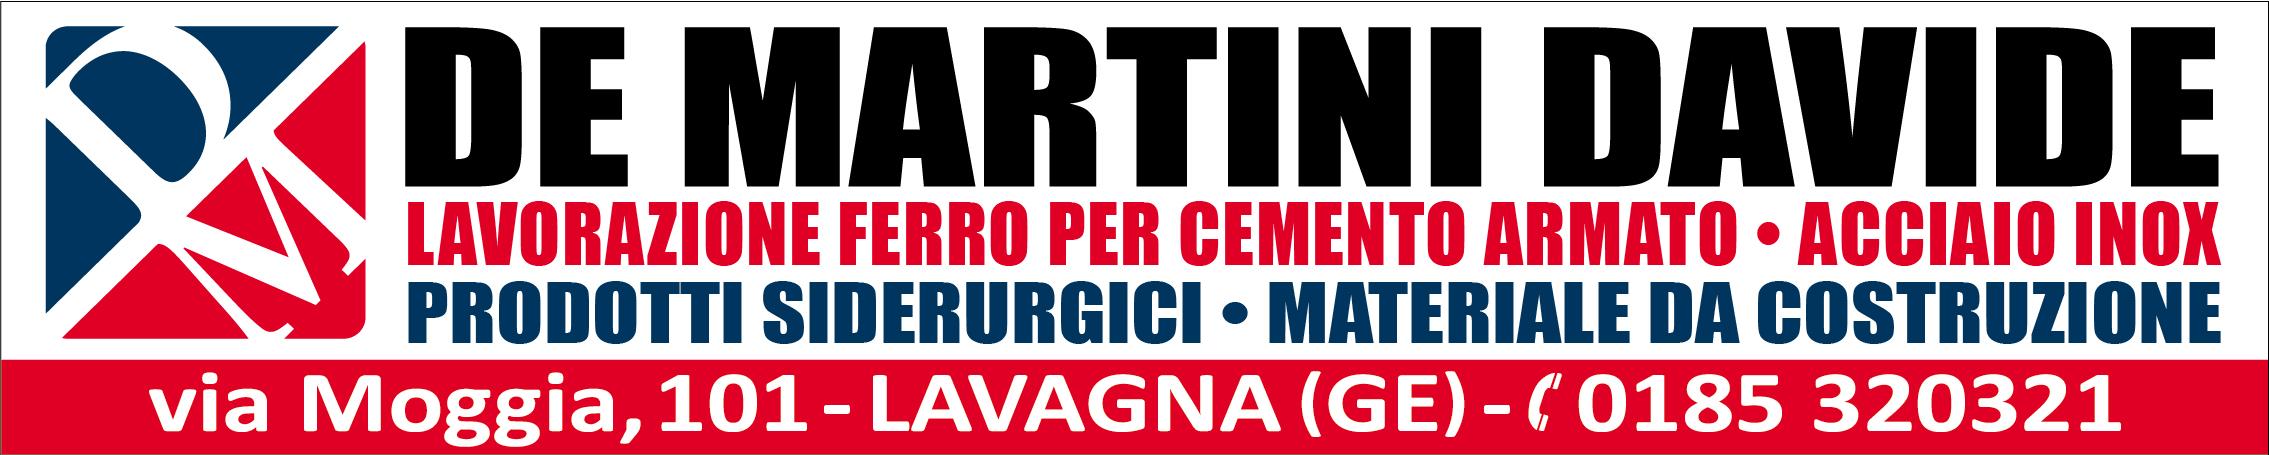 6. de martini davide